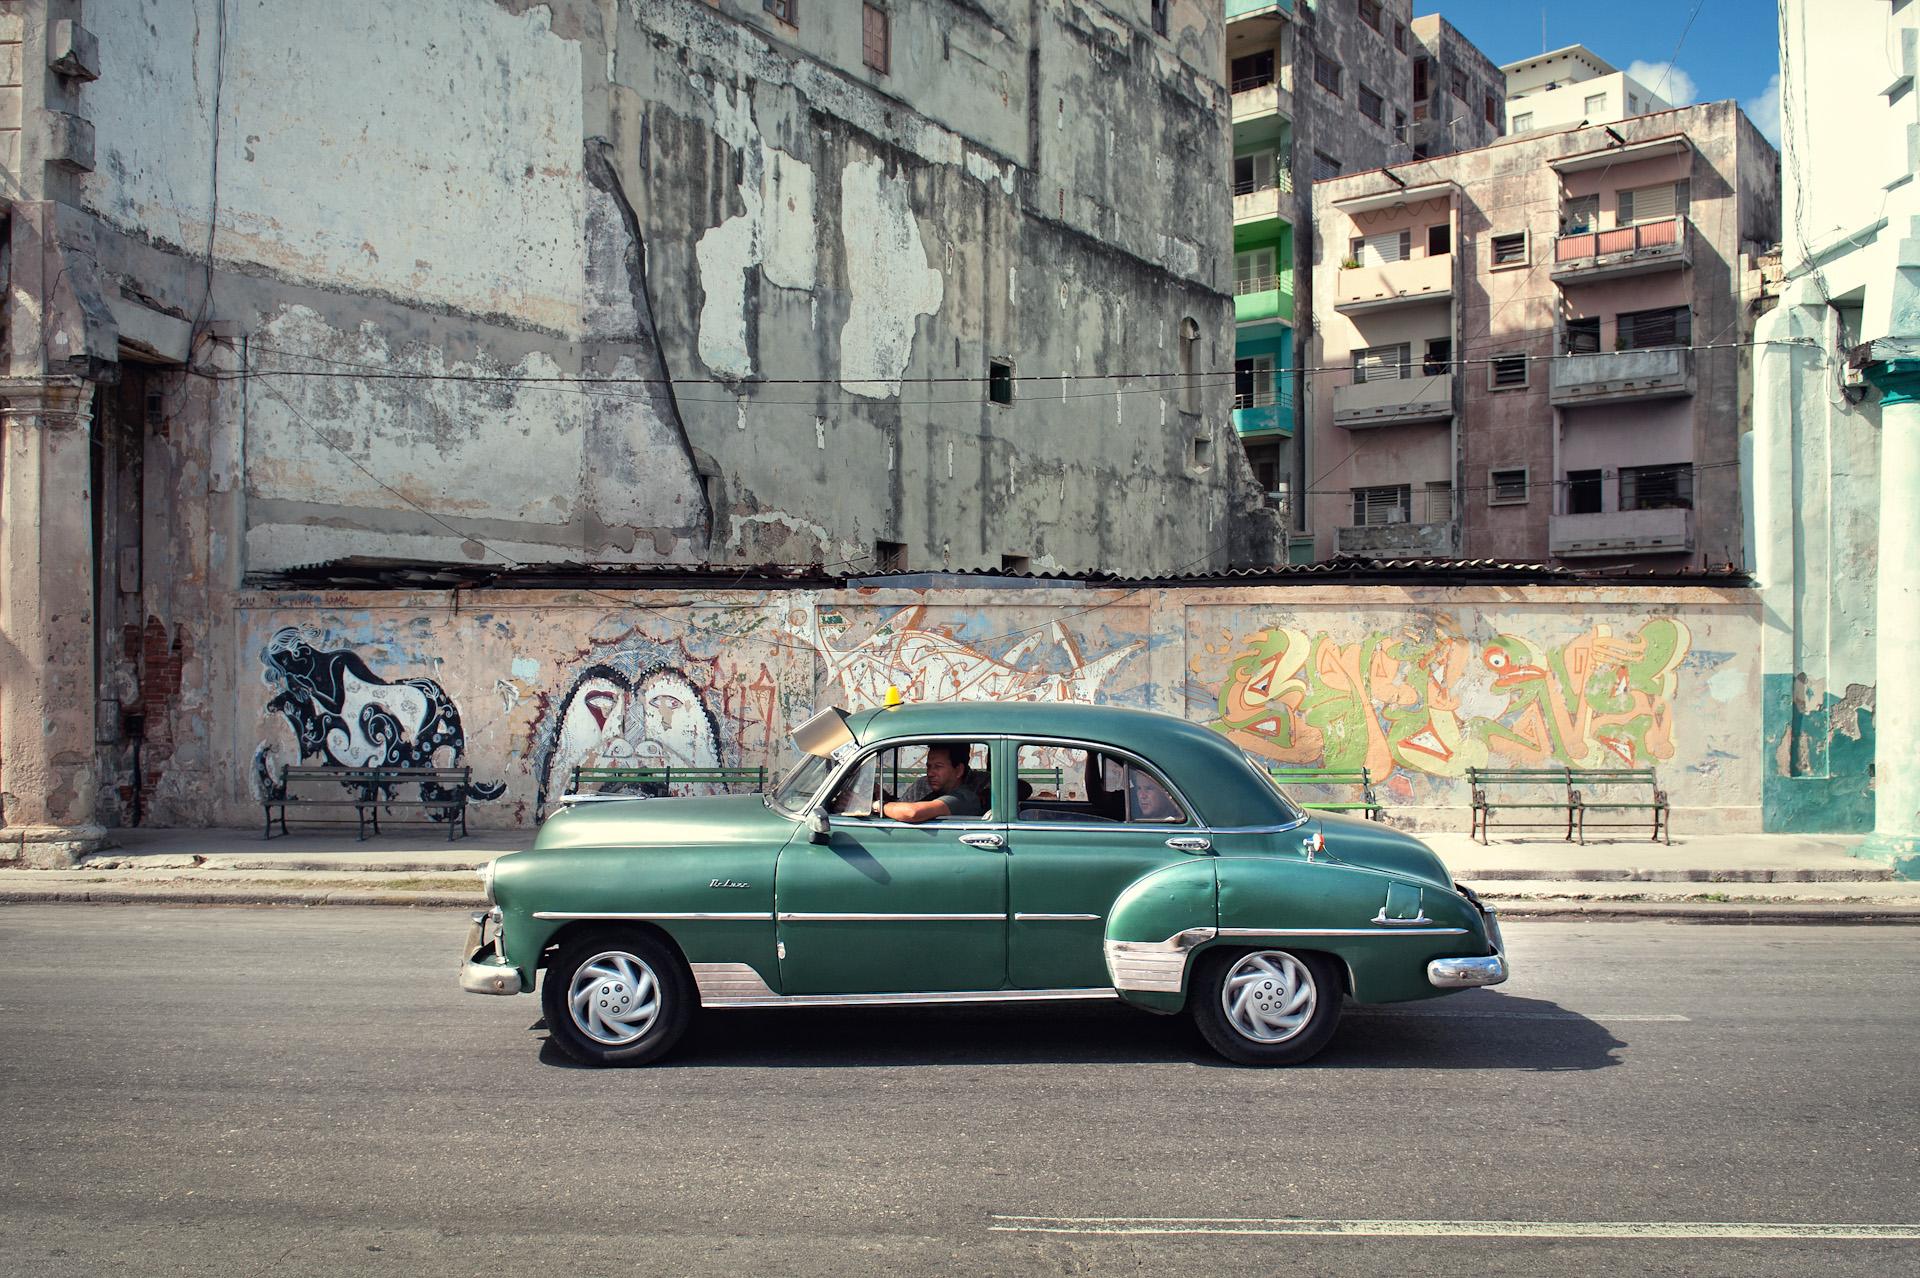 Jason_Bax_Travel_Cuba-Havana-Street_2.JPG